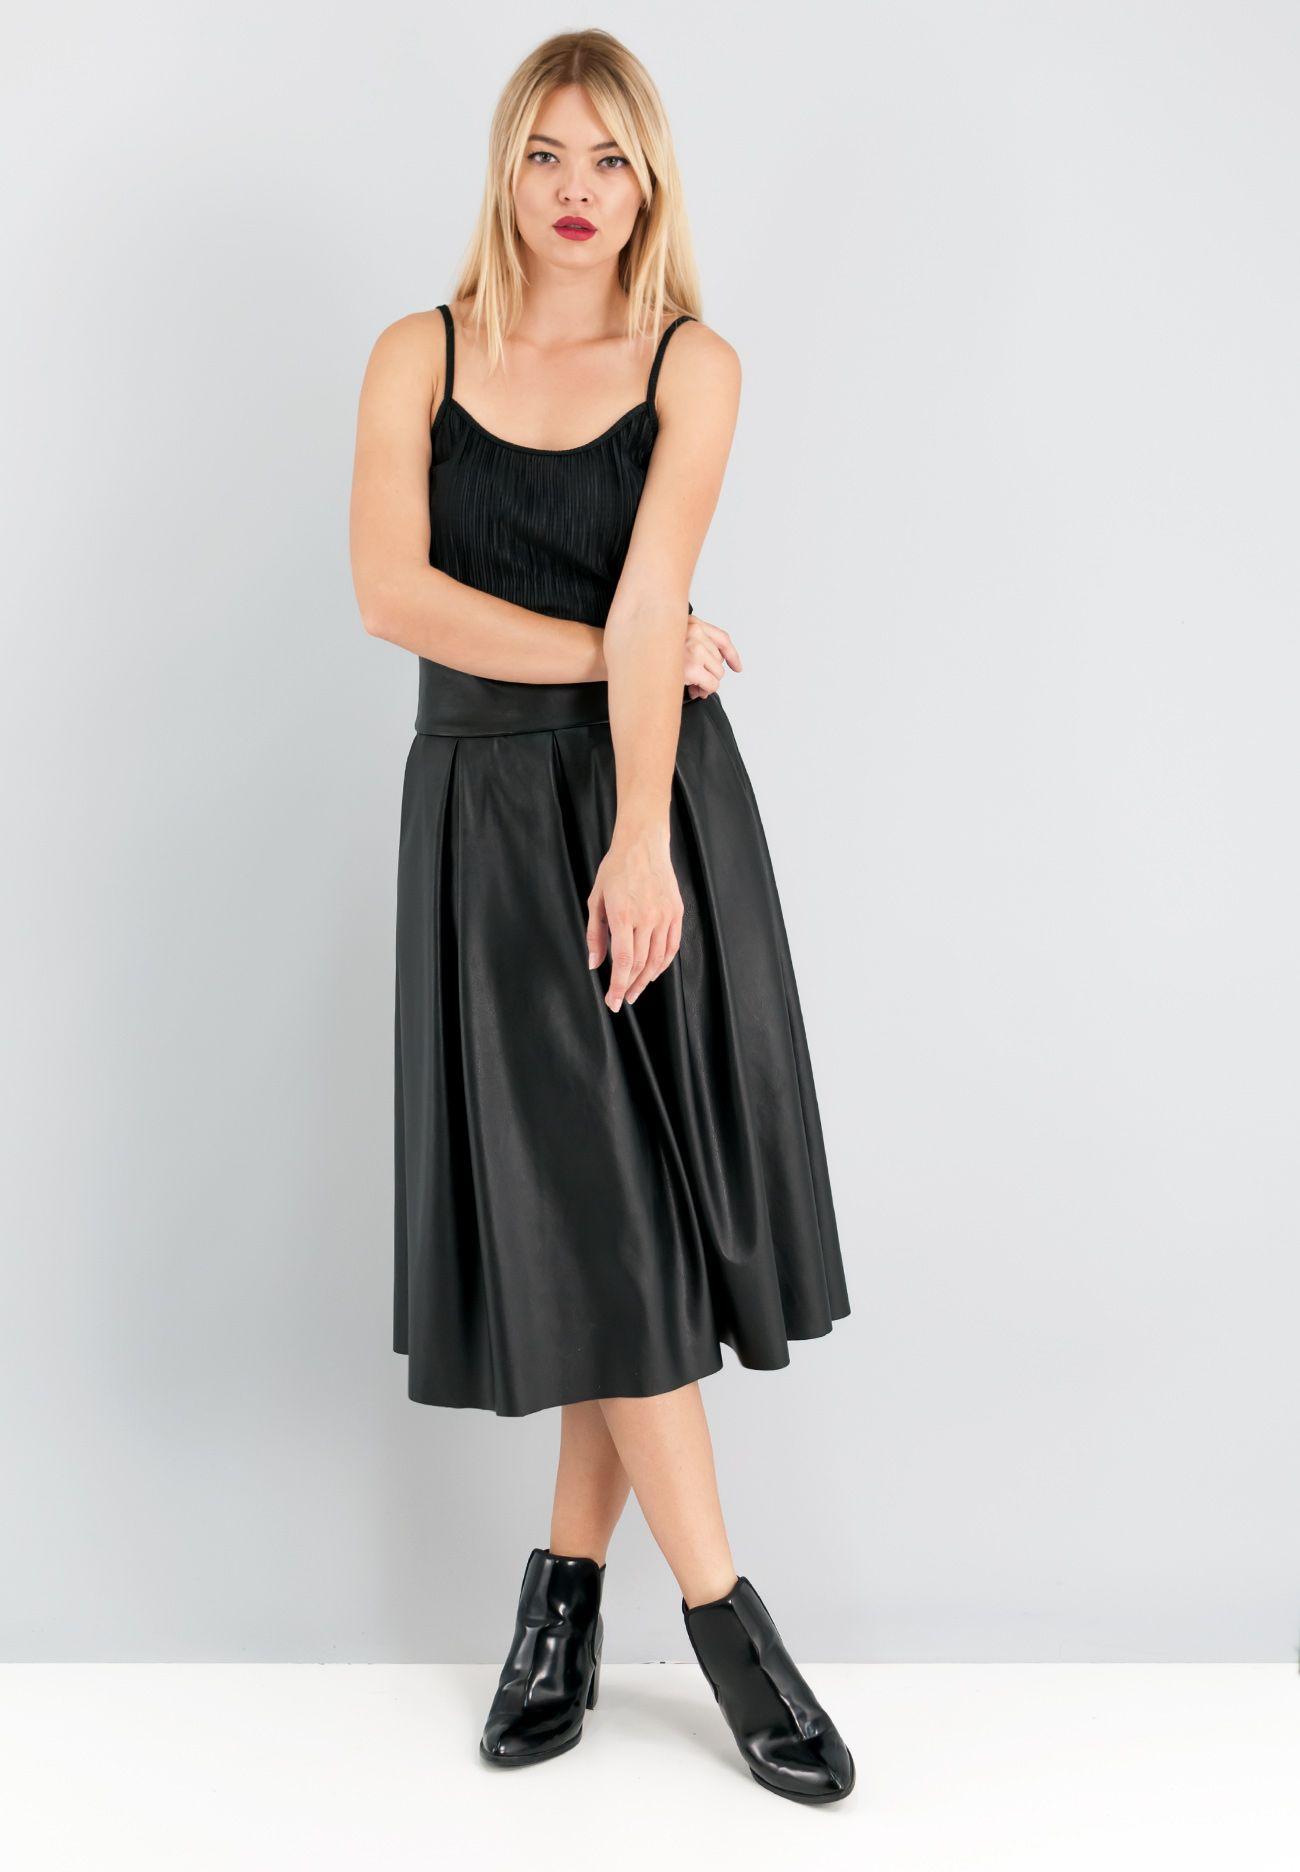 d98251033c6 Leather look midi φούστα σε Α γραμμή με πιέτες και τσέπες στα πλάγια ...